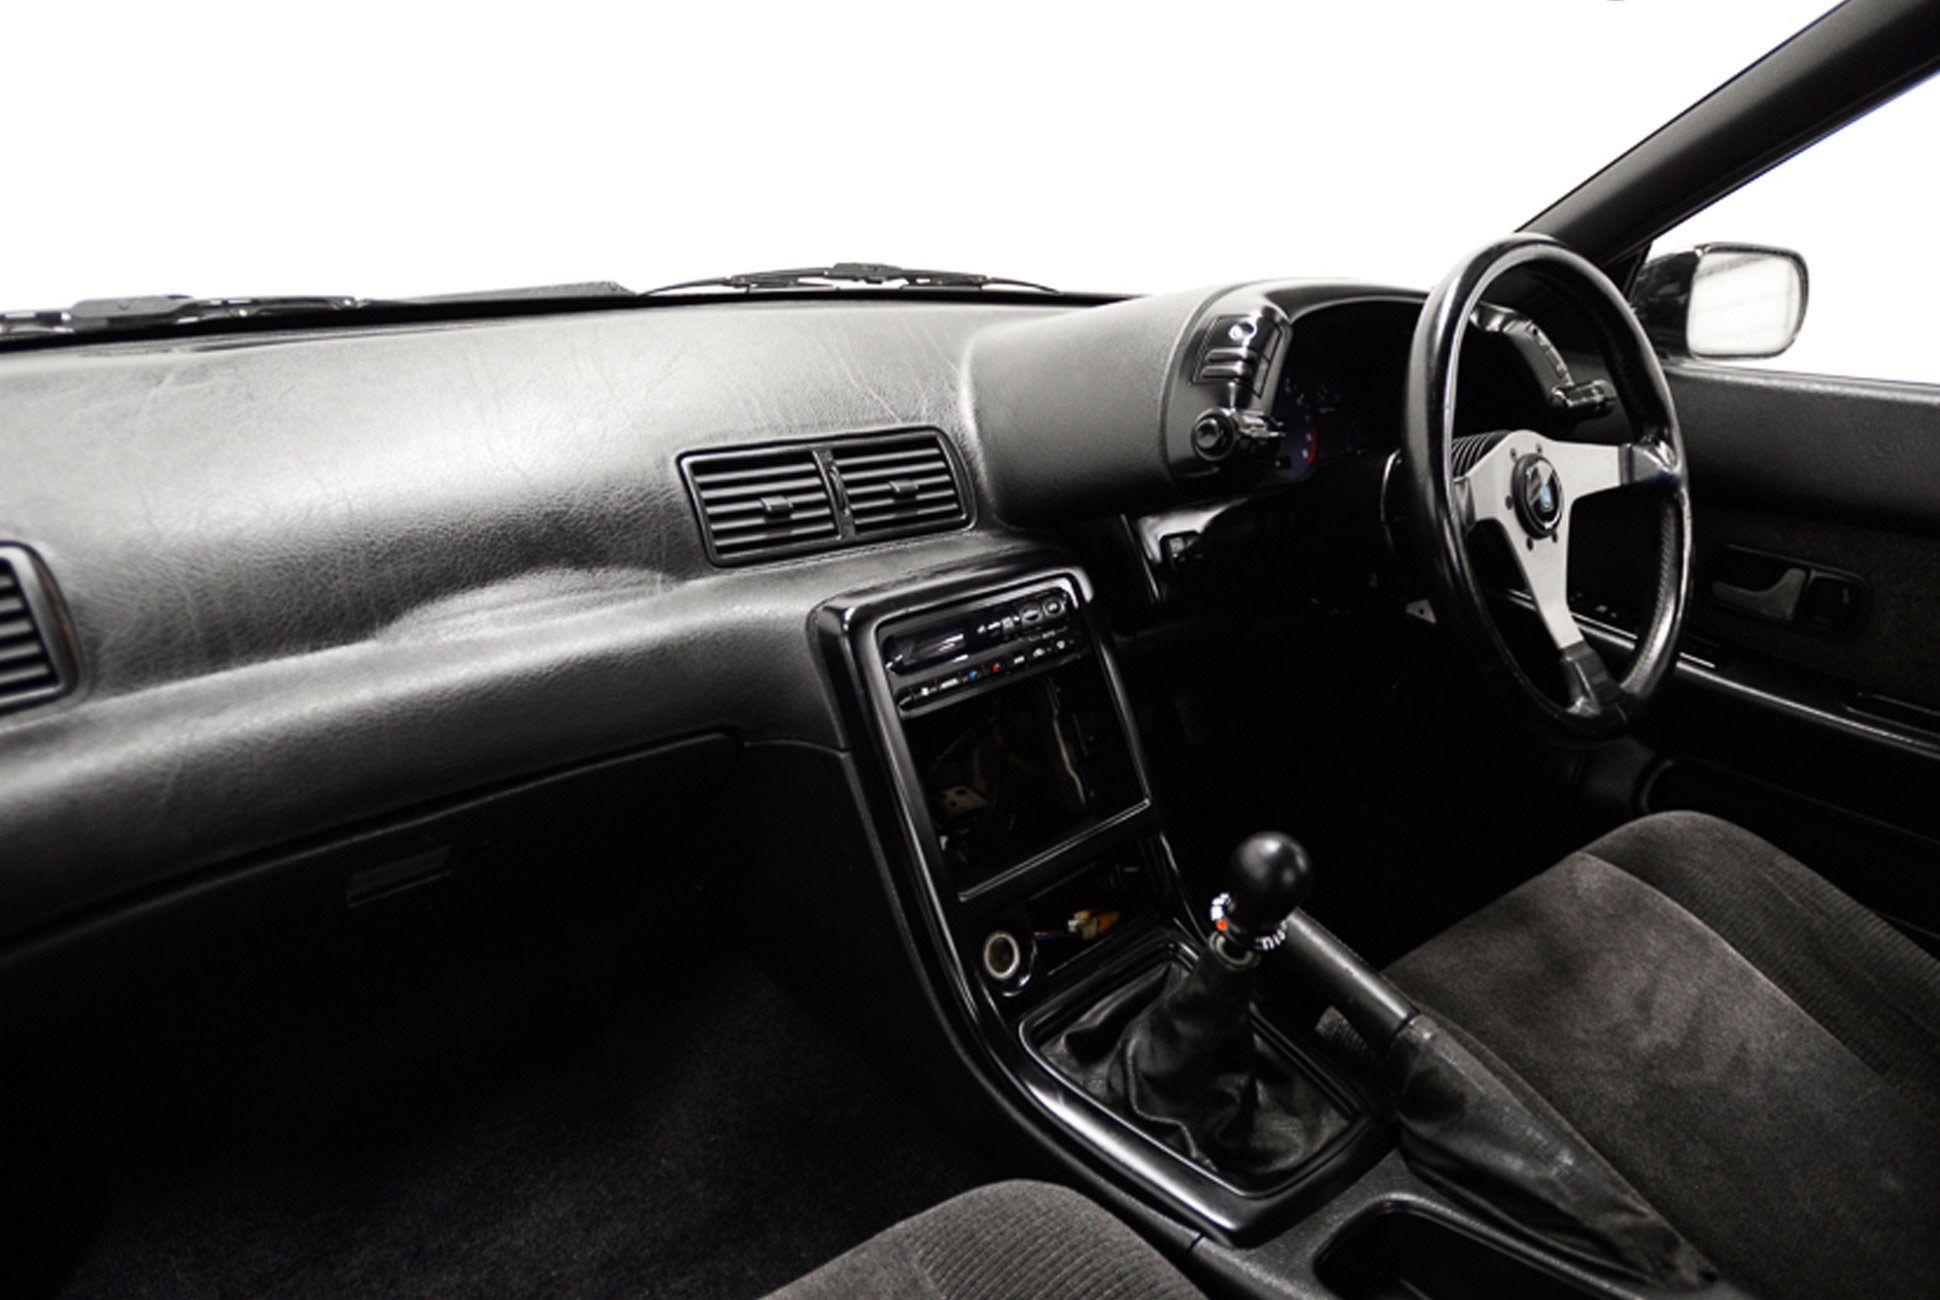 1989-Nissan-Skyline-R32-gear-patrol-slide-4